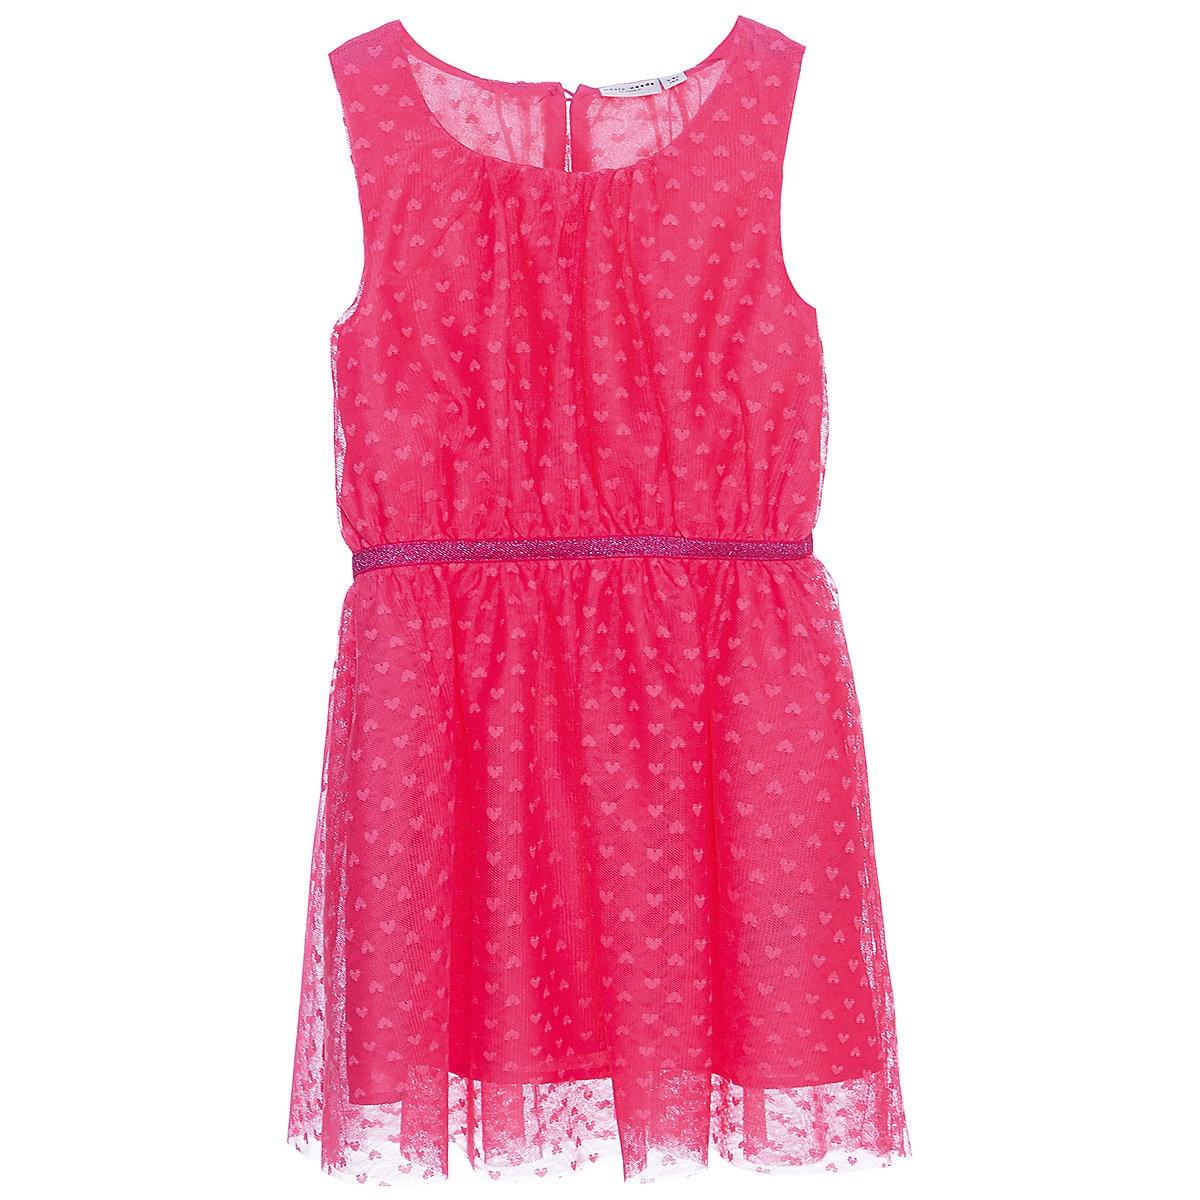 NAME IT Dresses 10623664 dress for girls baby clothing fashion slim family long sleeve mesh dress for girls